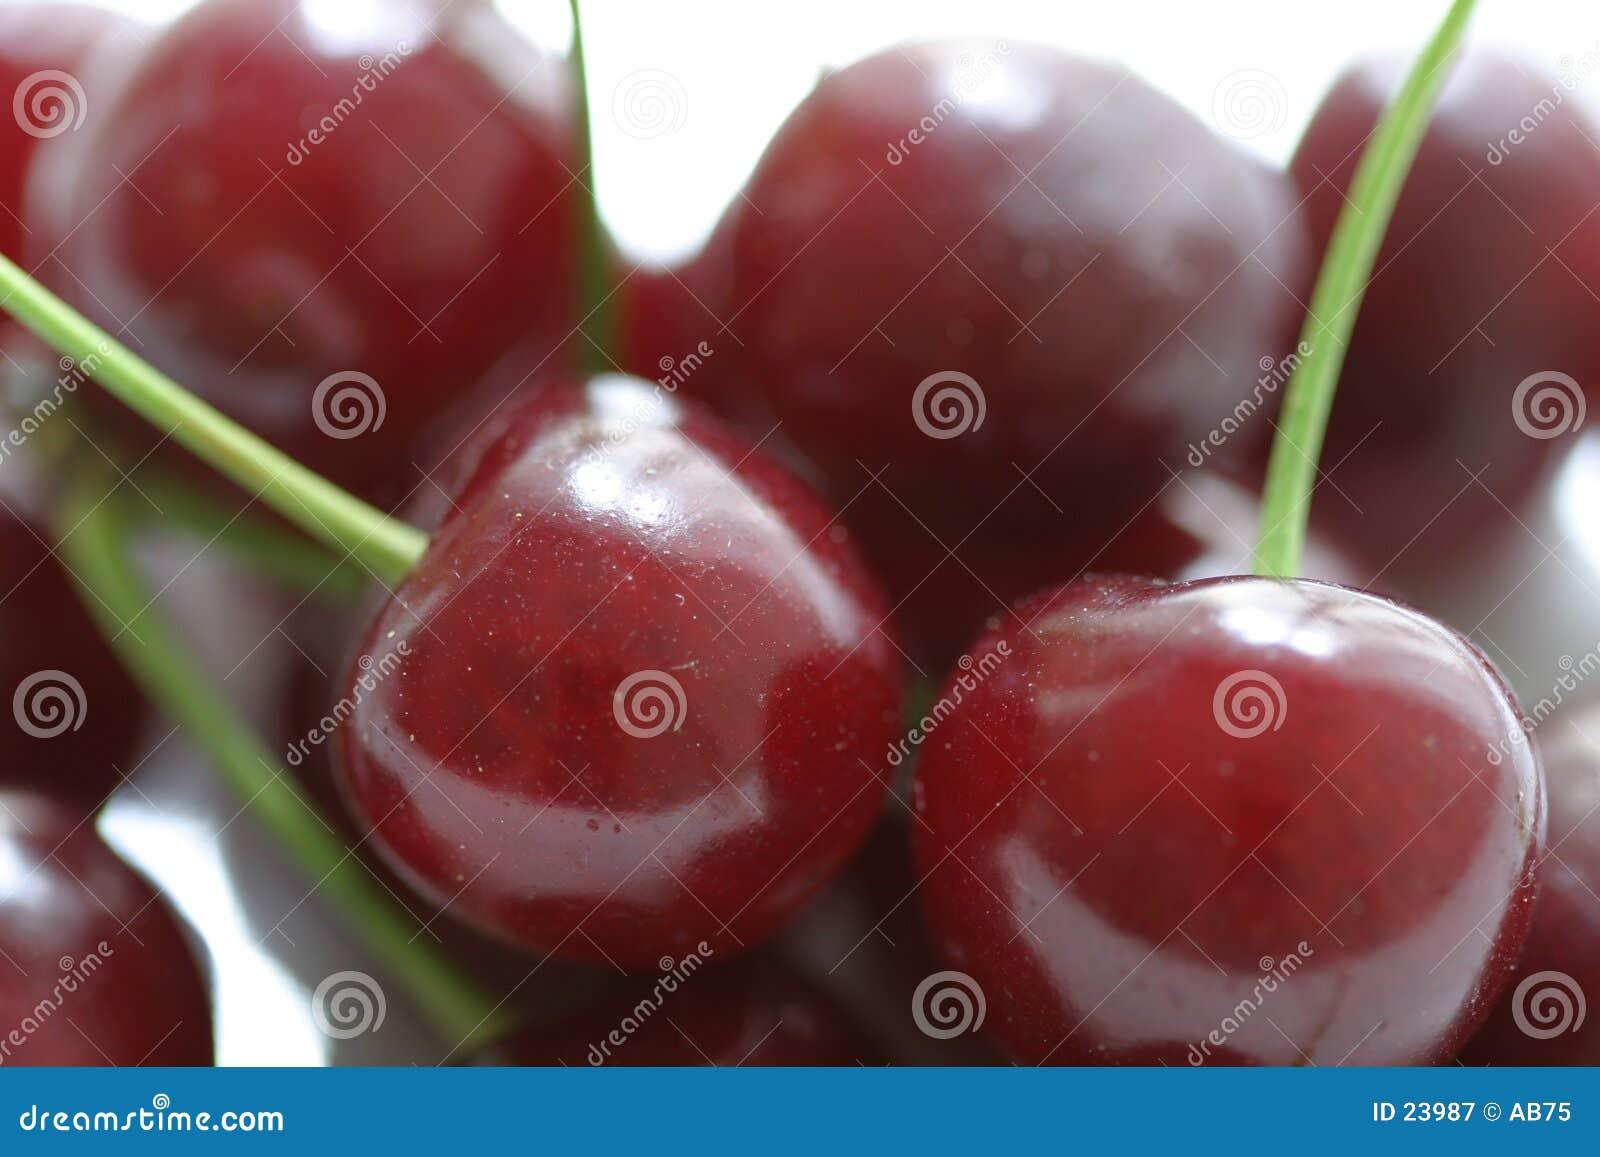 Cherrystems